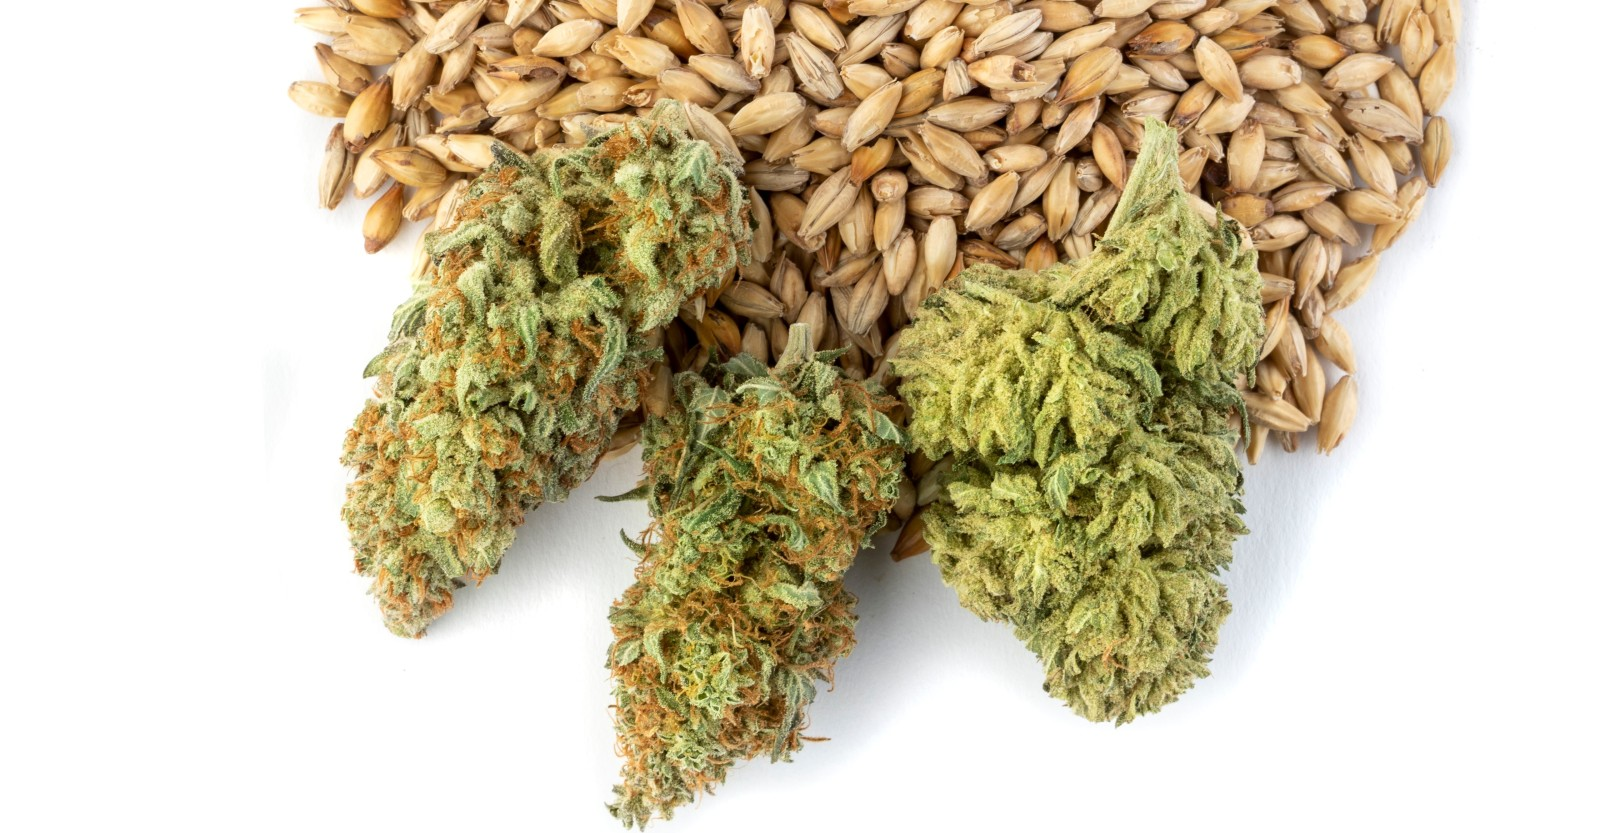 Dosing Homebrew With Marijuana Tinctures | Craft Beer & Brewing